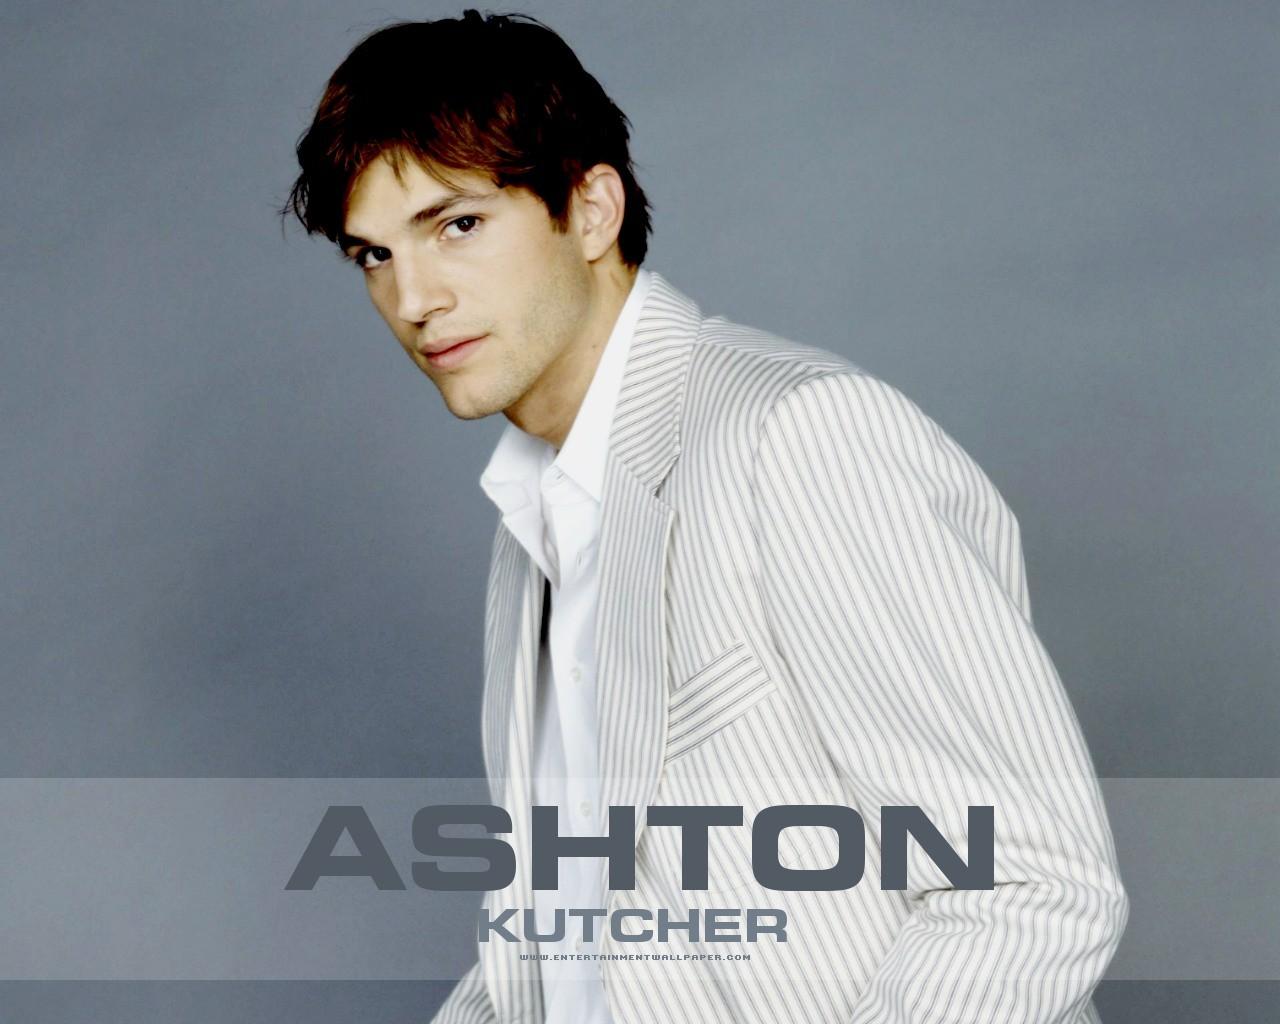 http://3.bp.blogspot.com/-70N7_lyu33c/T_lnktZr5OI/AAAAAAAADts/GAmRUYB4pp8/s1600/Ashton--kutcher-HD-Wallpaper-2012-07.jpg